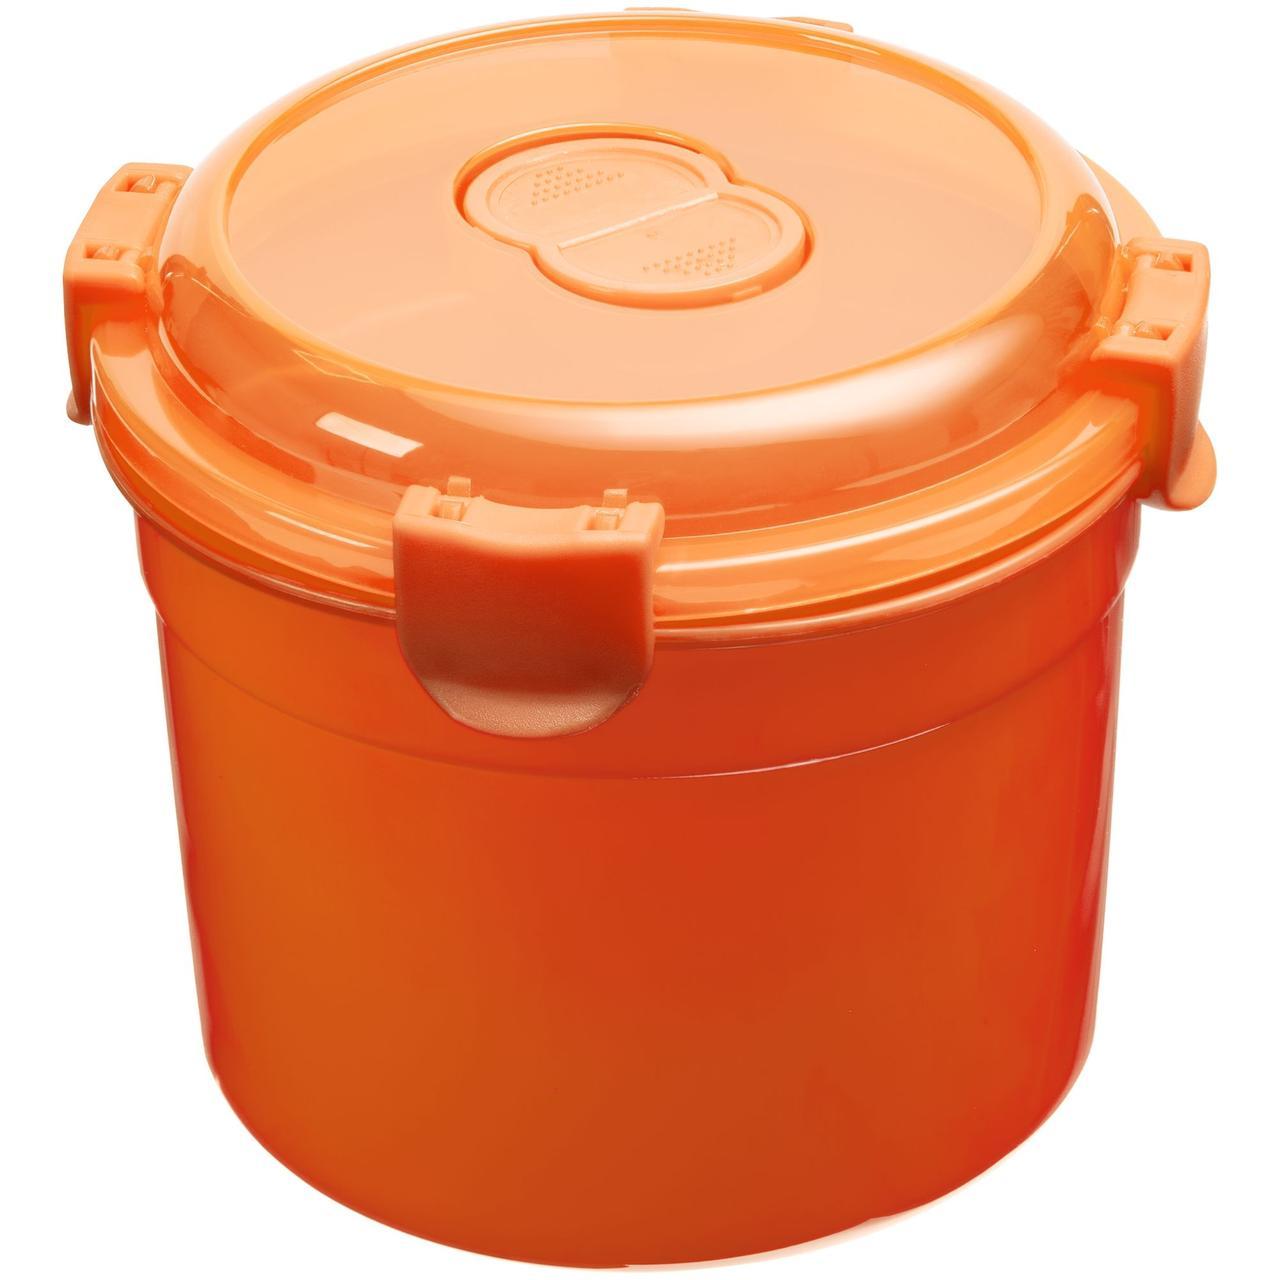 Ланчбокс Barrel Roll, оранжевый (артикул 10173.20)